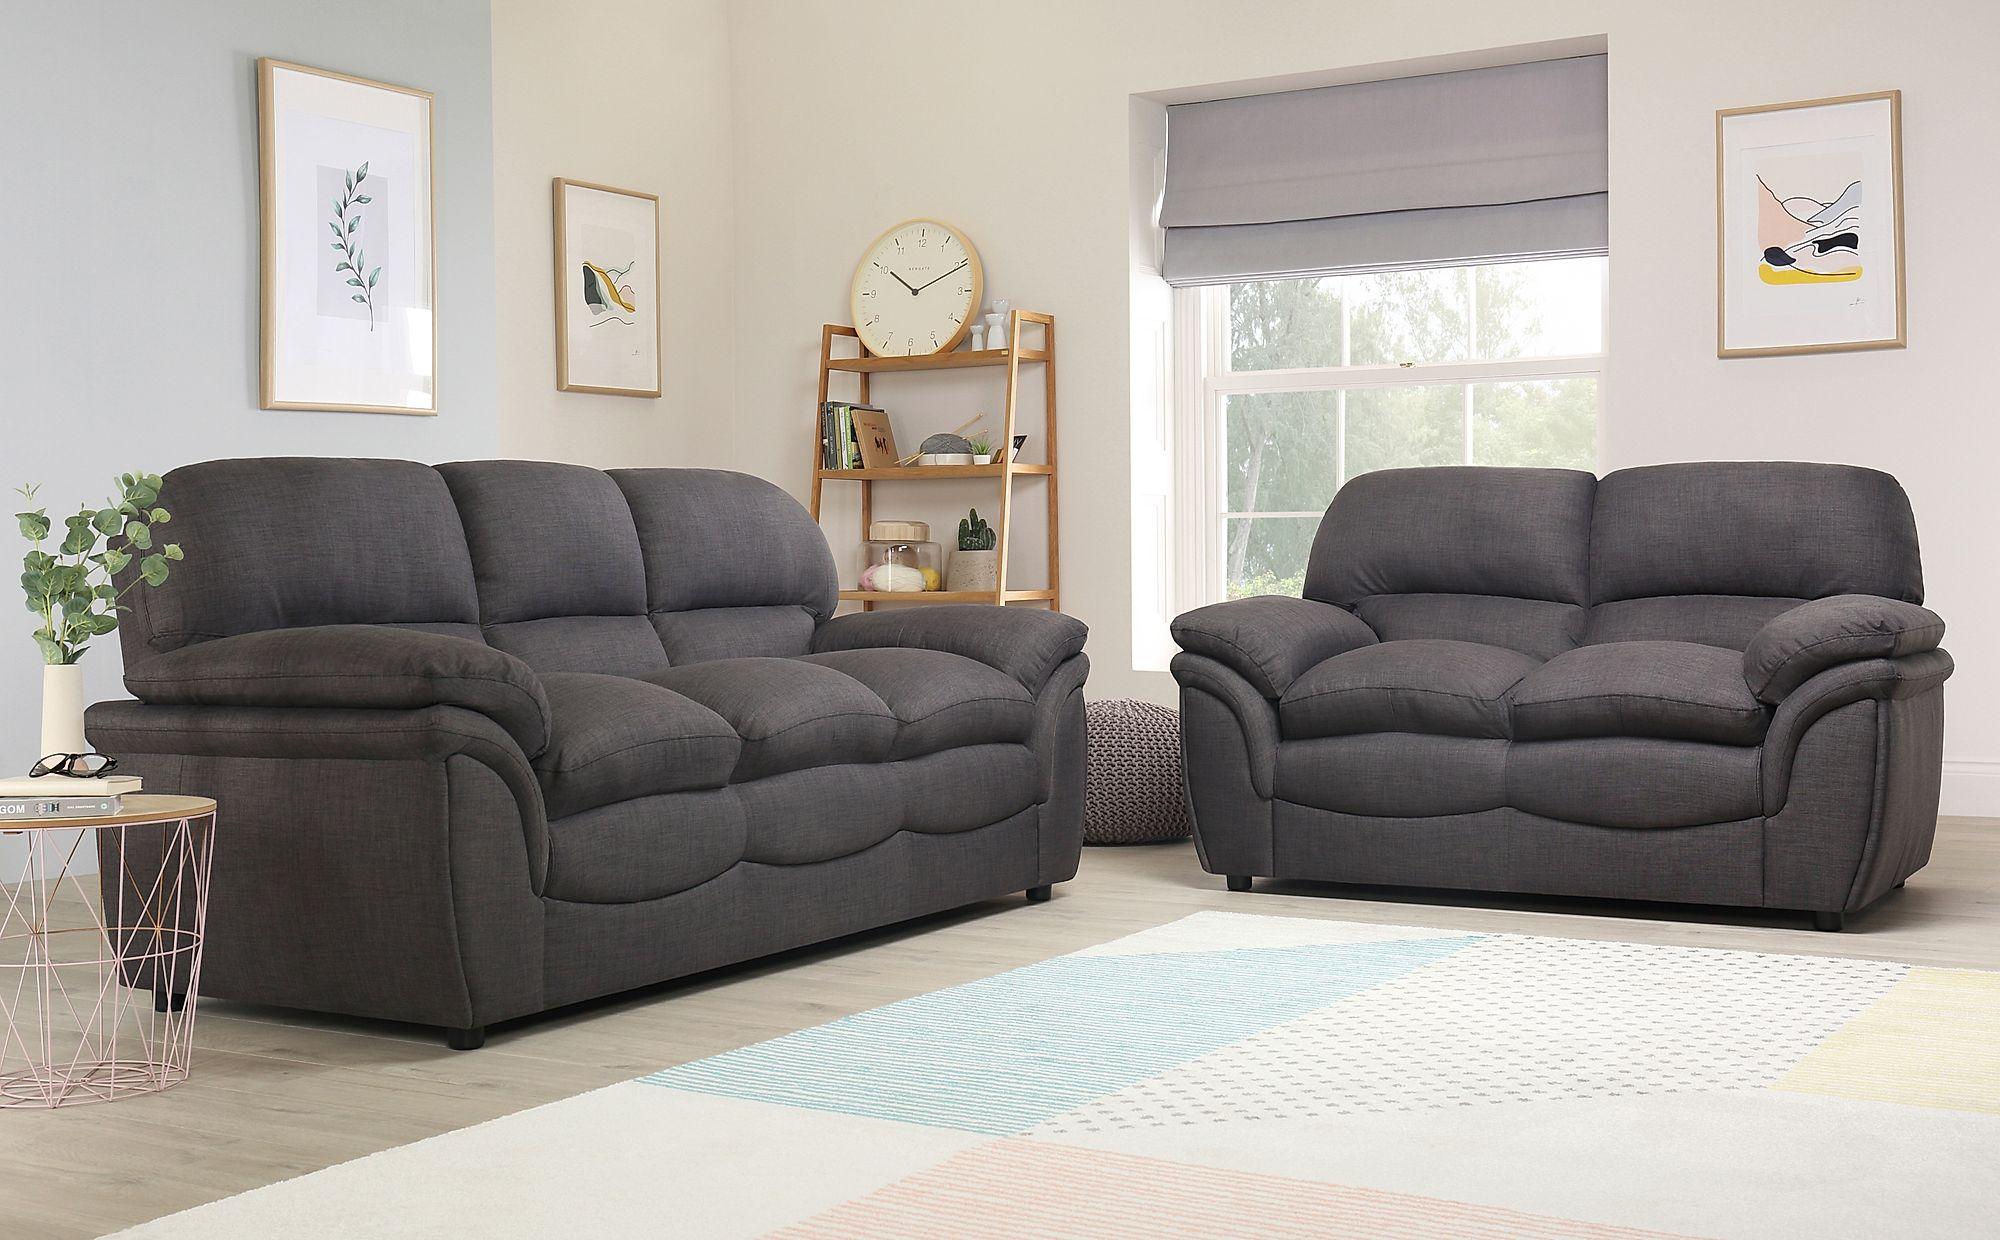 Rochester Slate Grey Fabric 3+2 Seater Sofa Set ...